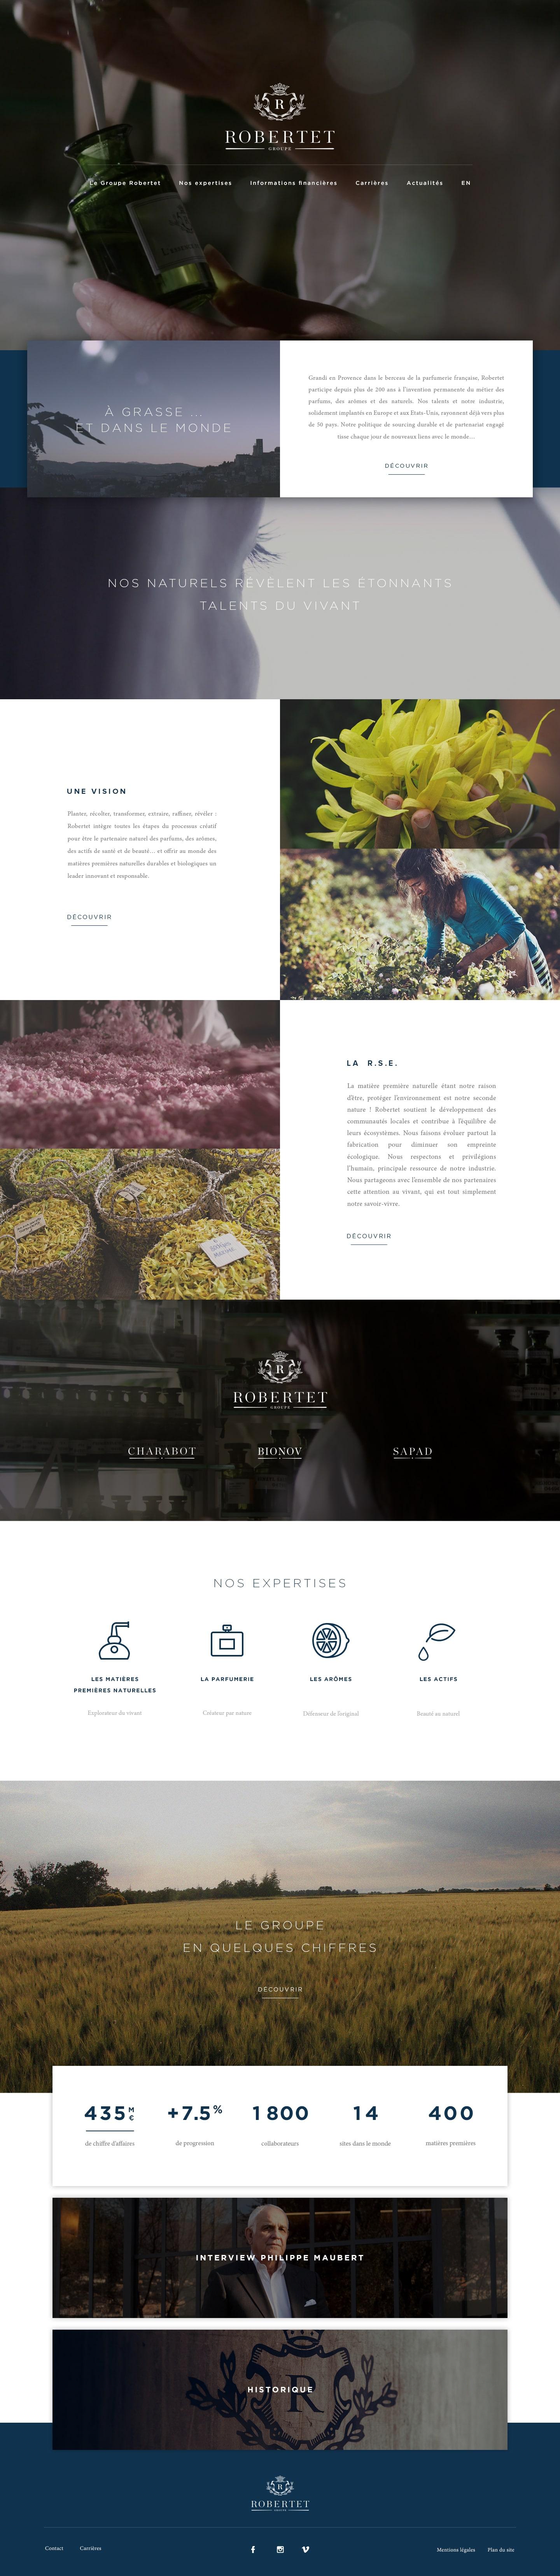 Homepage-v5